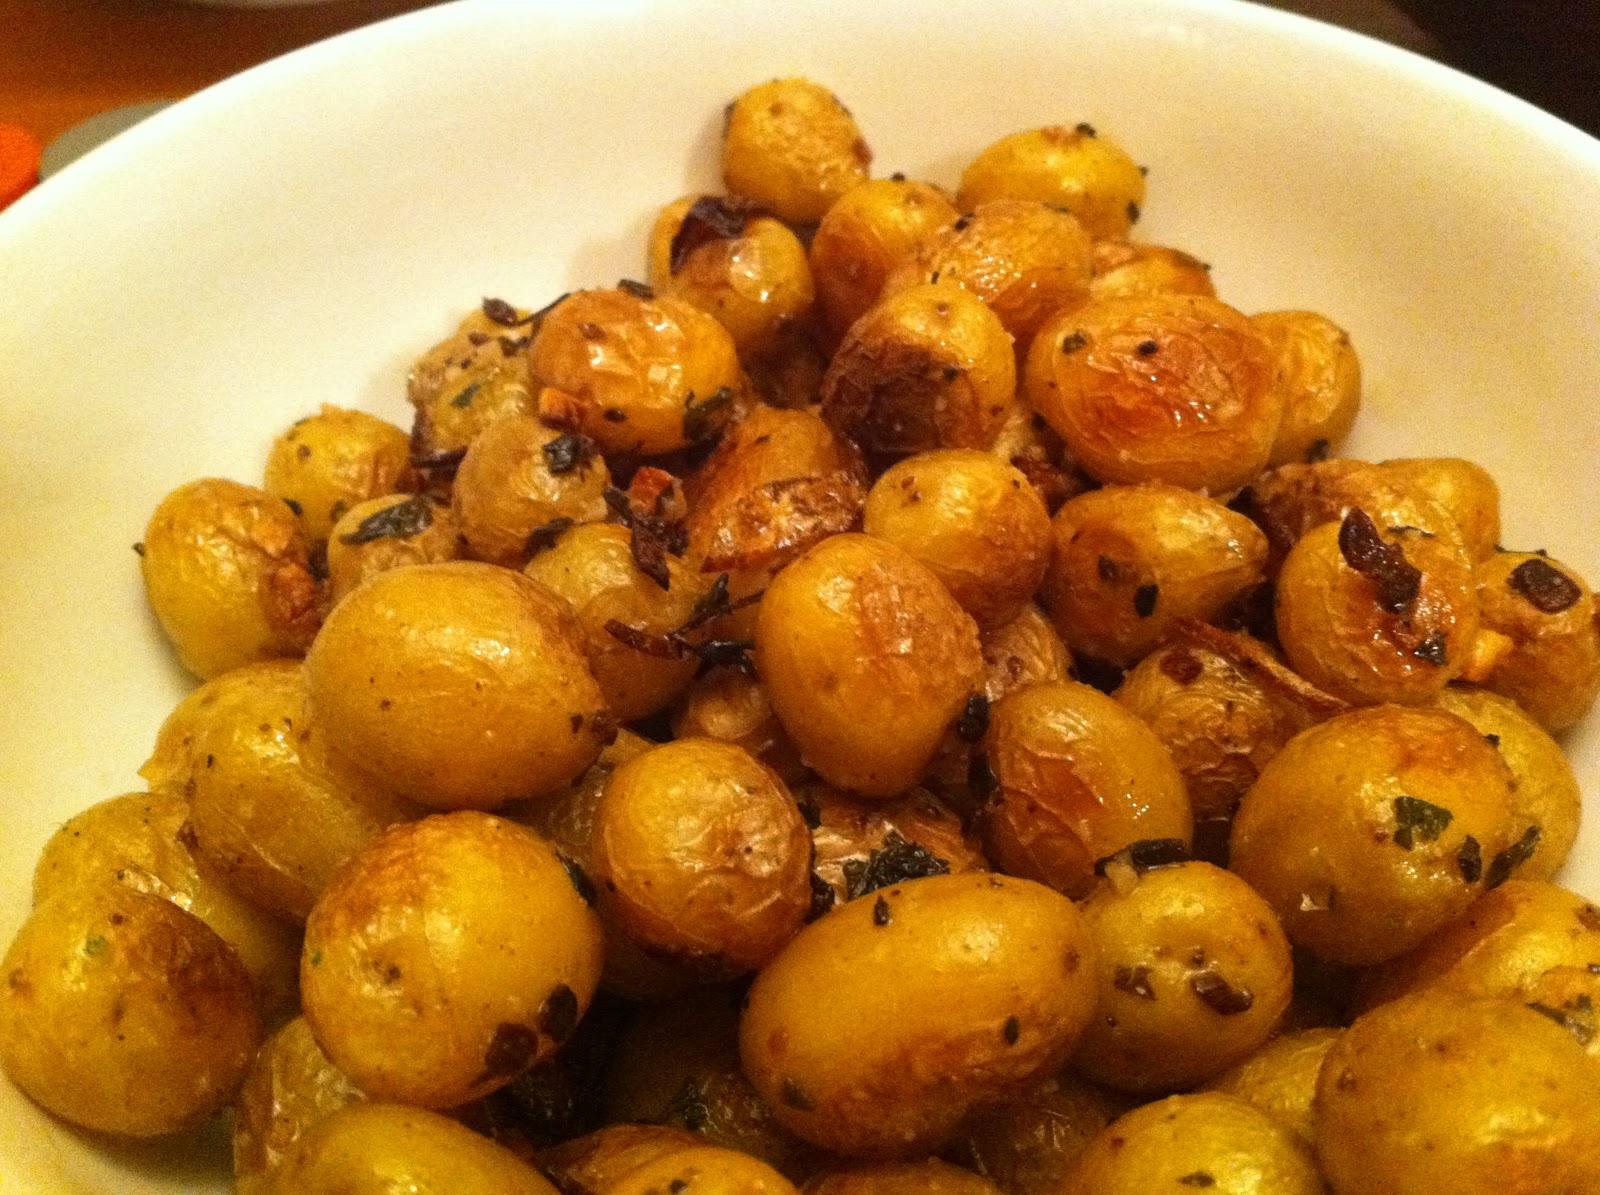 Tender little earthy nuggets of potatoey goodness.